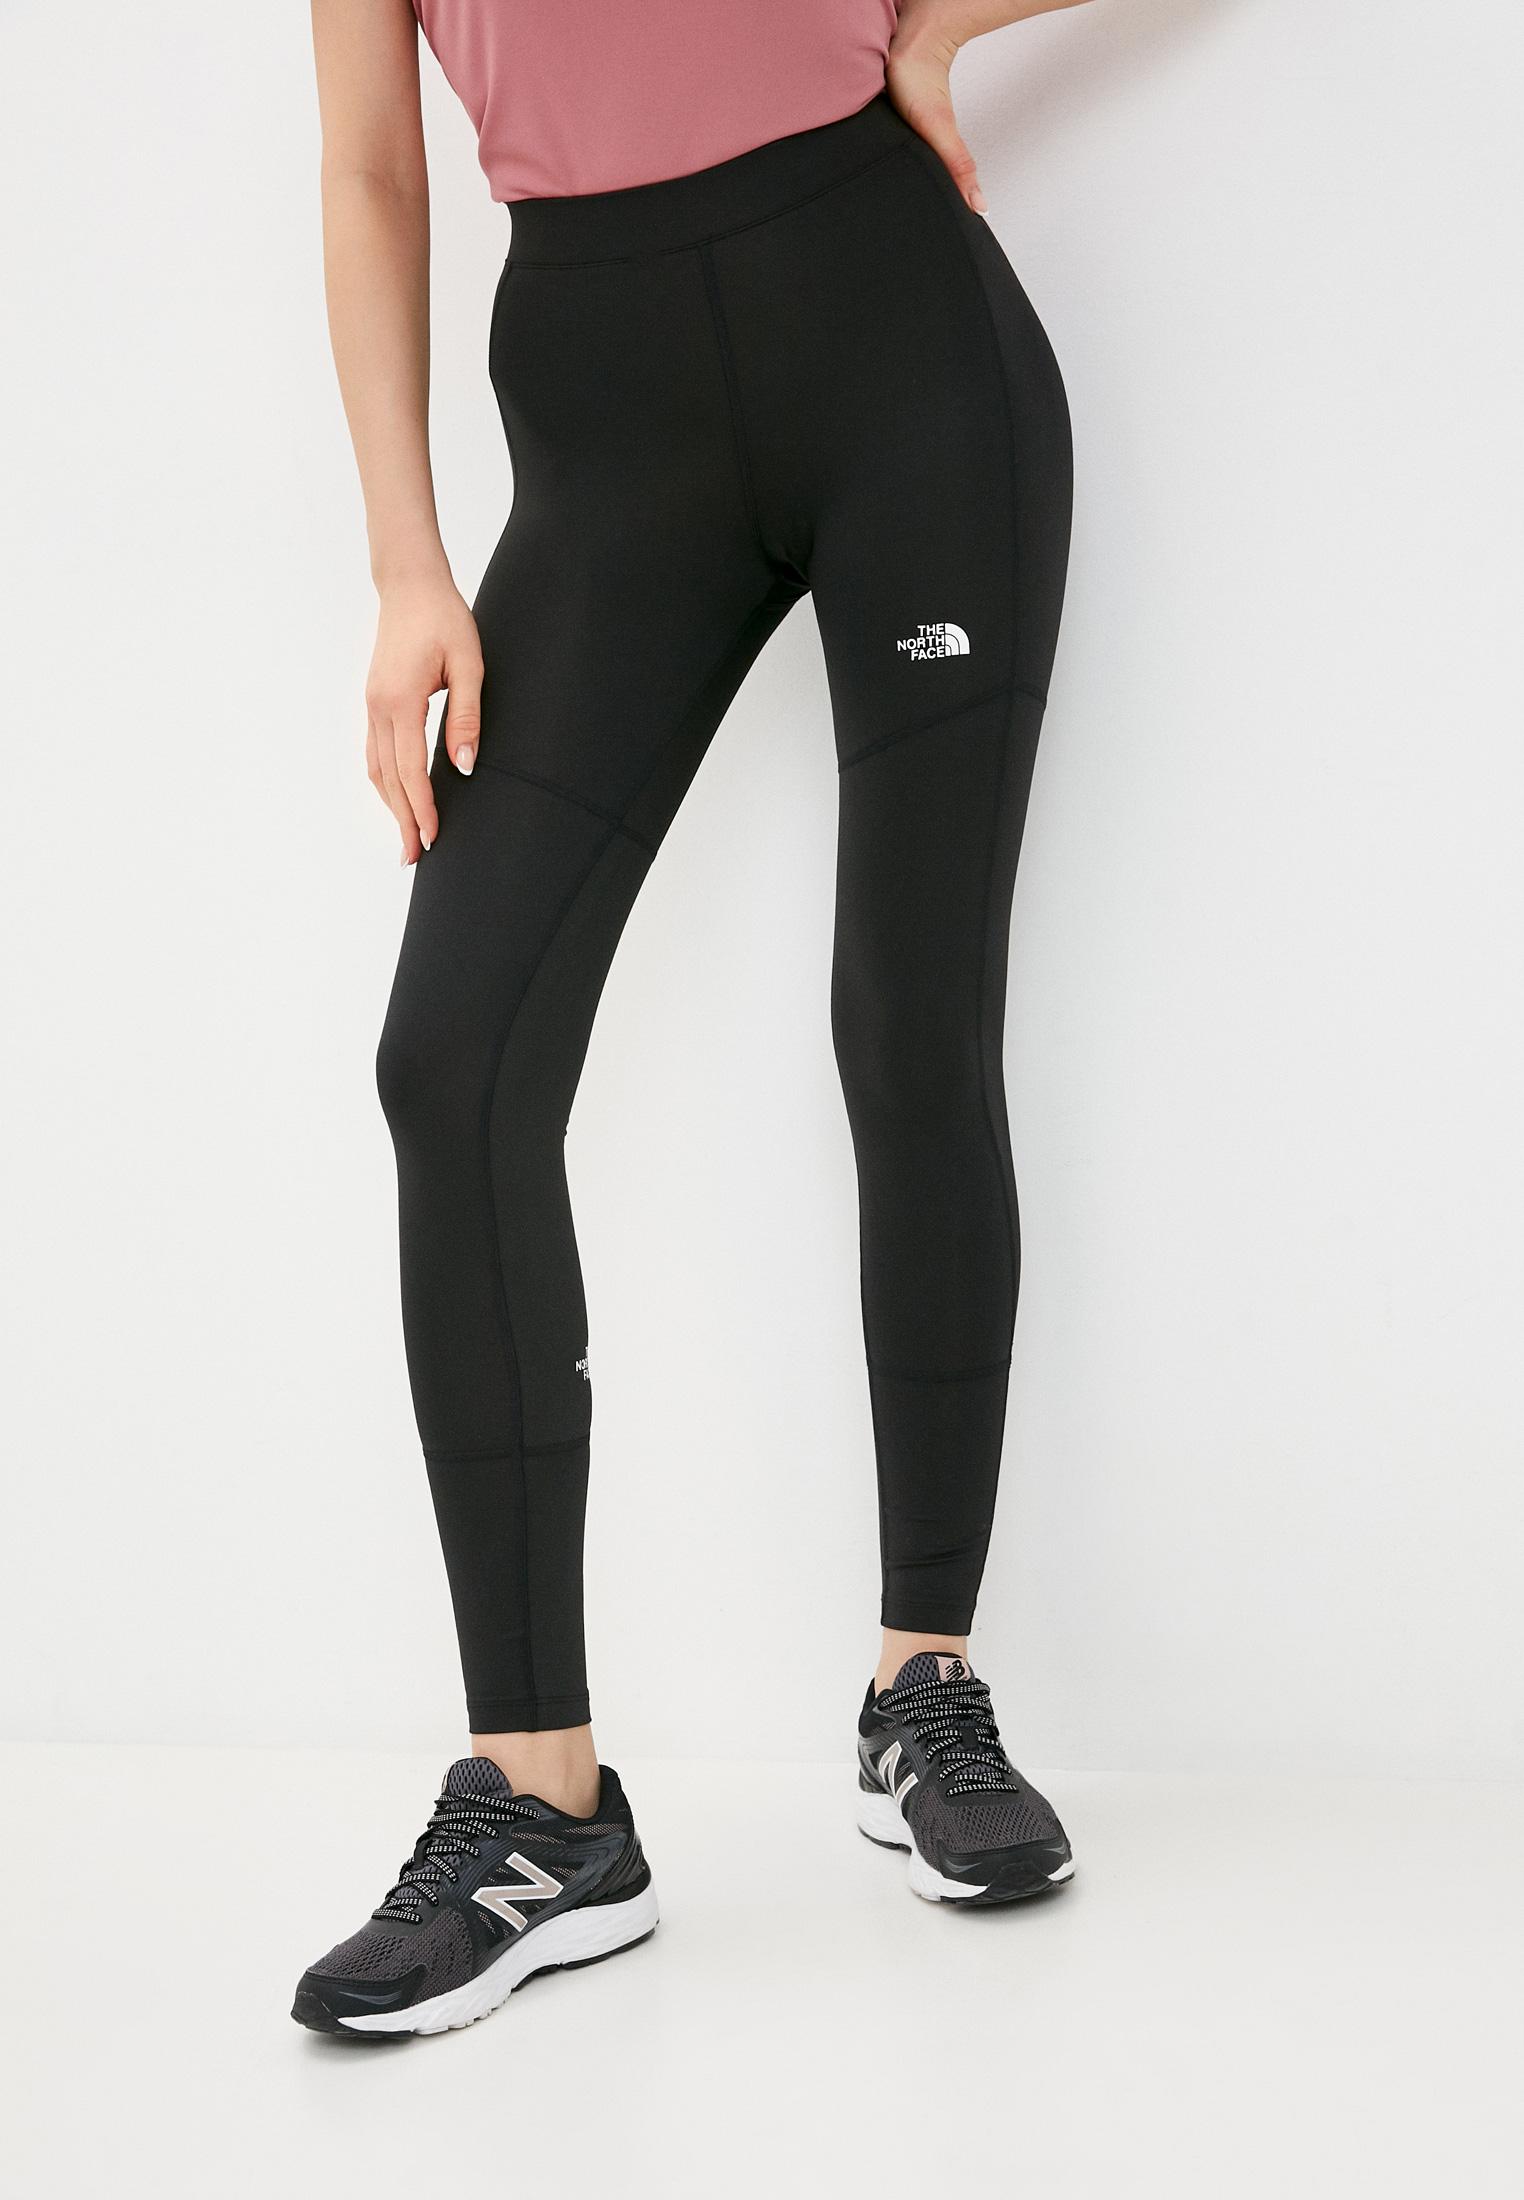 Женские брюки The North Face (Зе Норт Фейс) TA4SW5